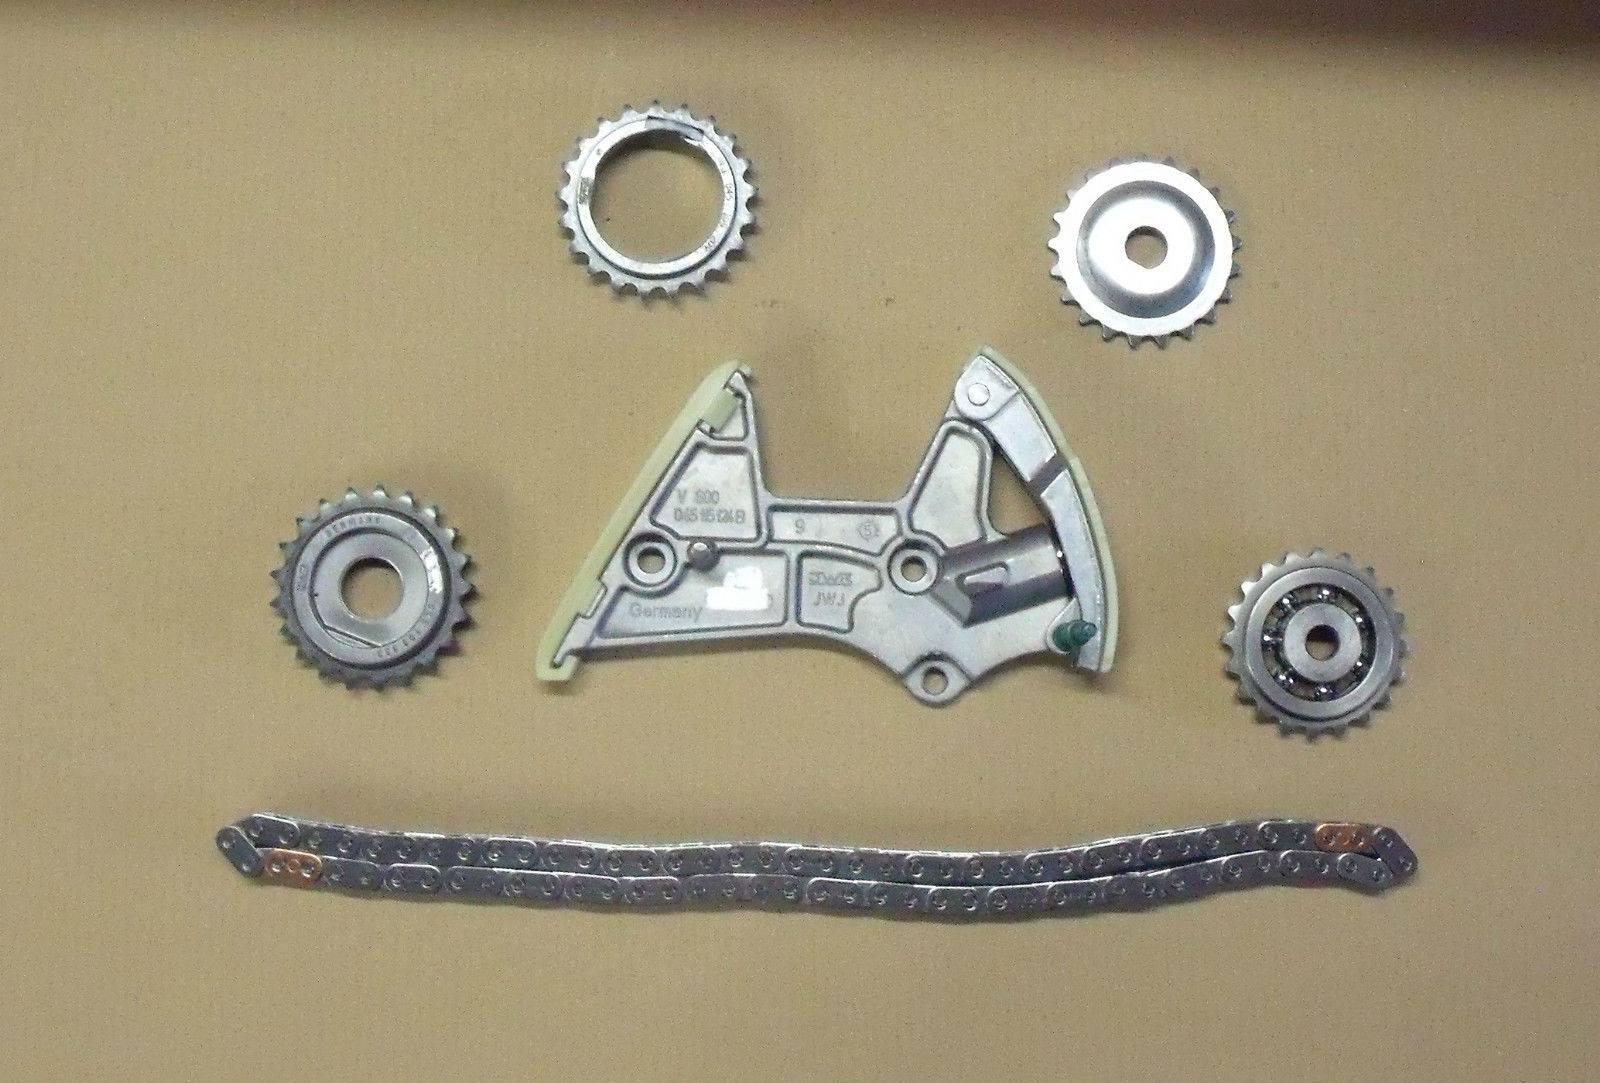 Vw Diesel Engines >> Audi A2 1.4 TDI Oil Pump Timing Chain Kit - AW Shop